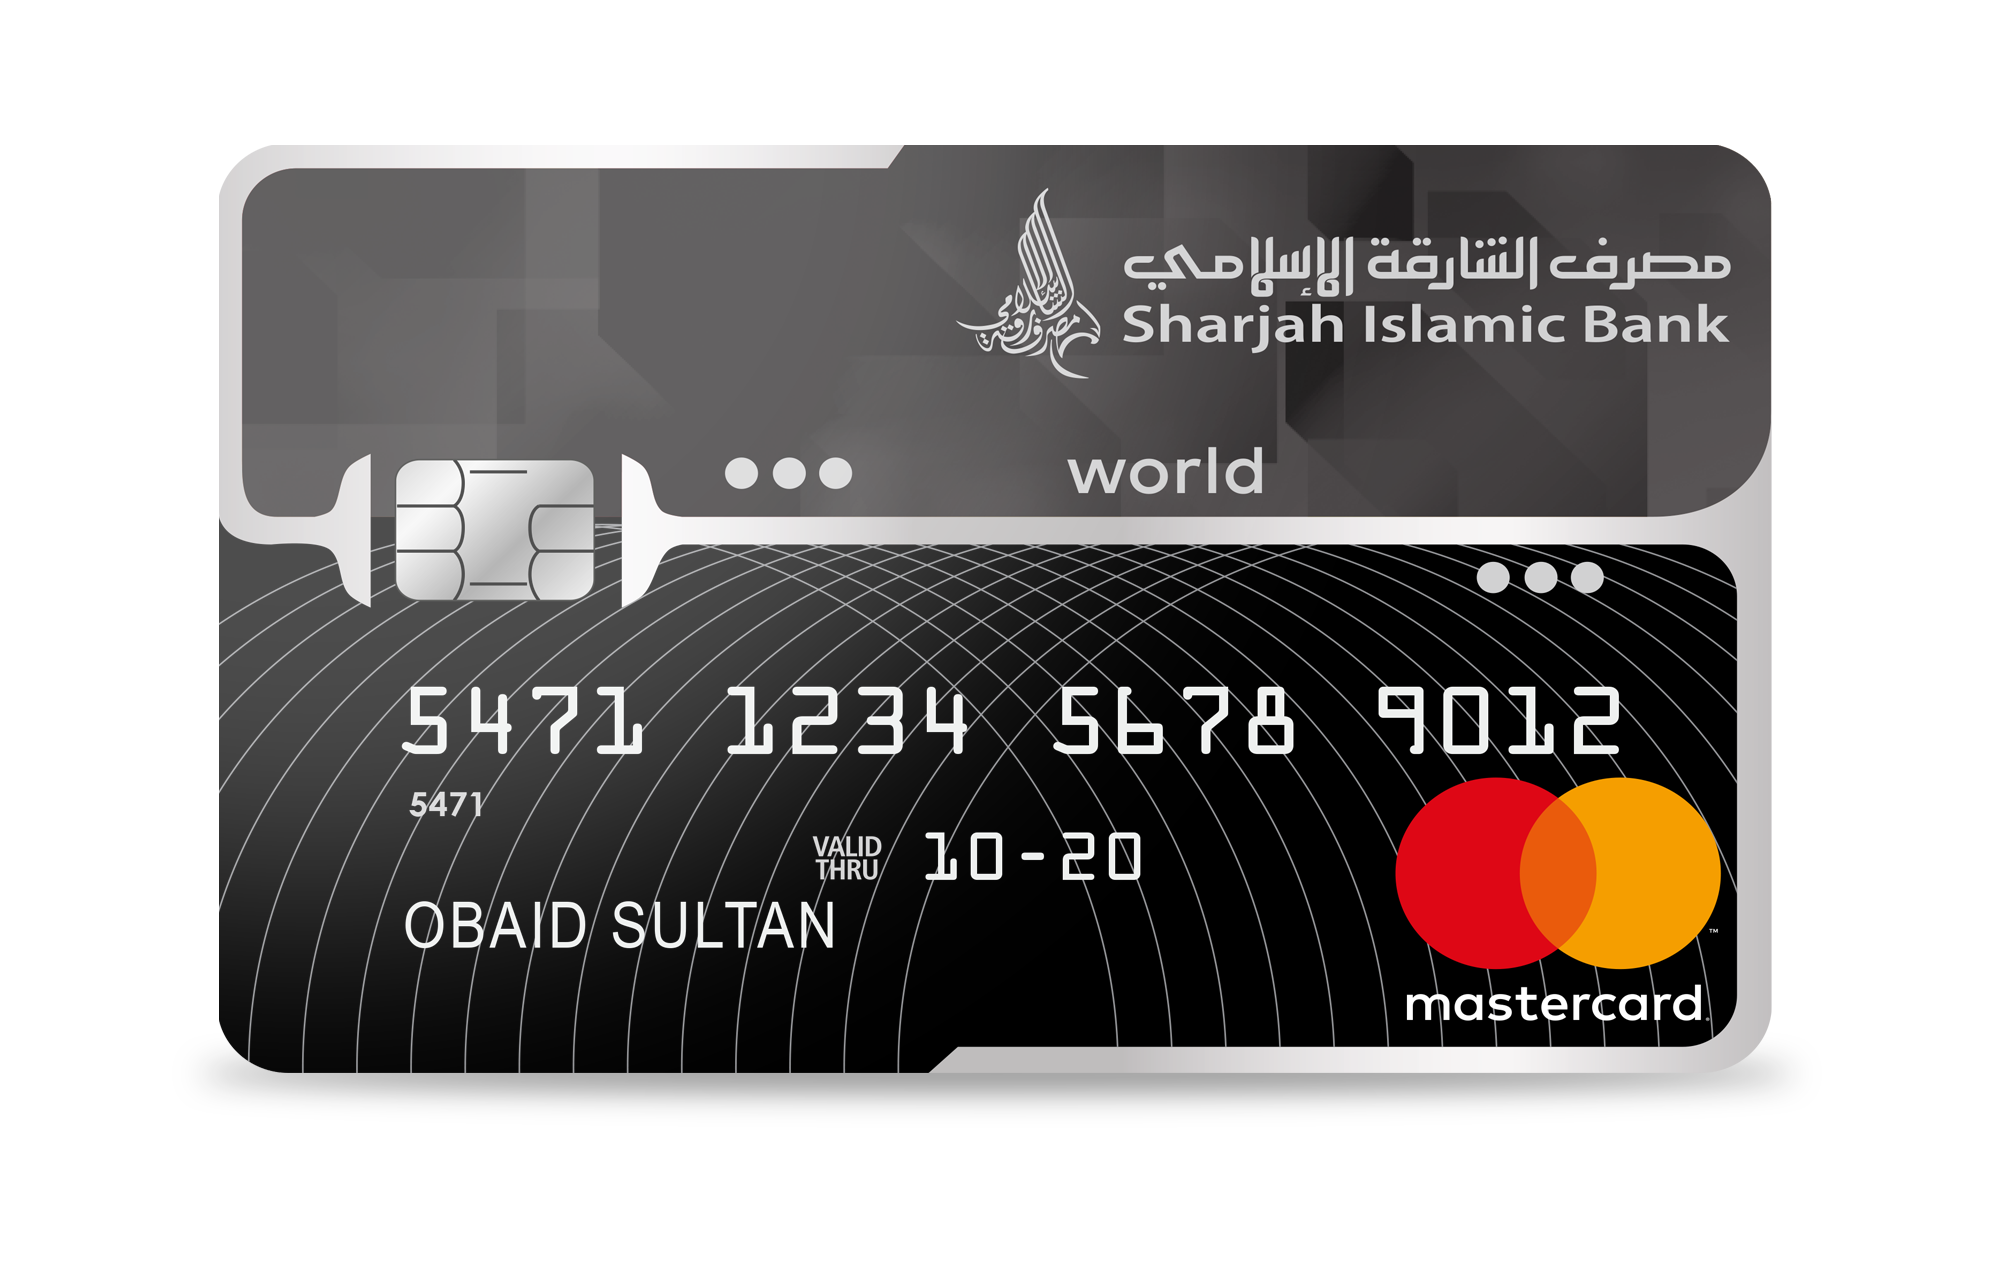 Standard chartered bank titanium credit card sib smiles world credit card falaconquin